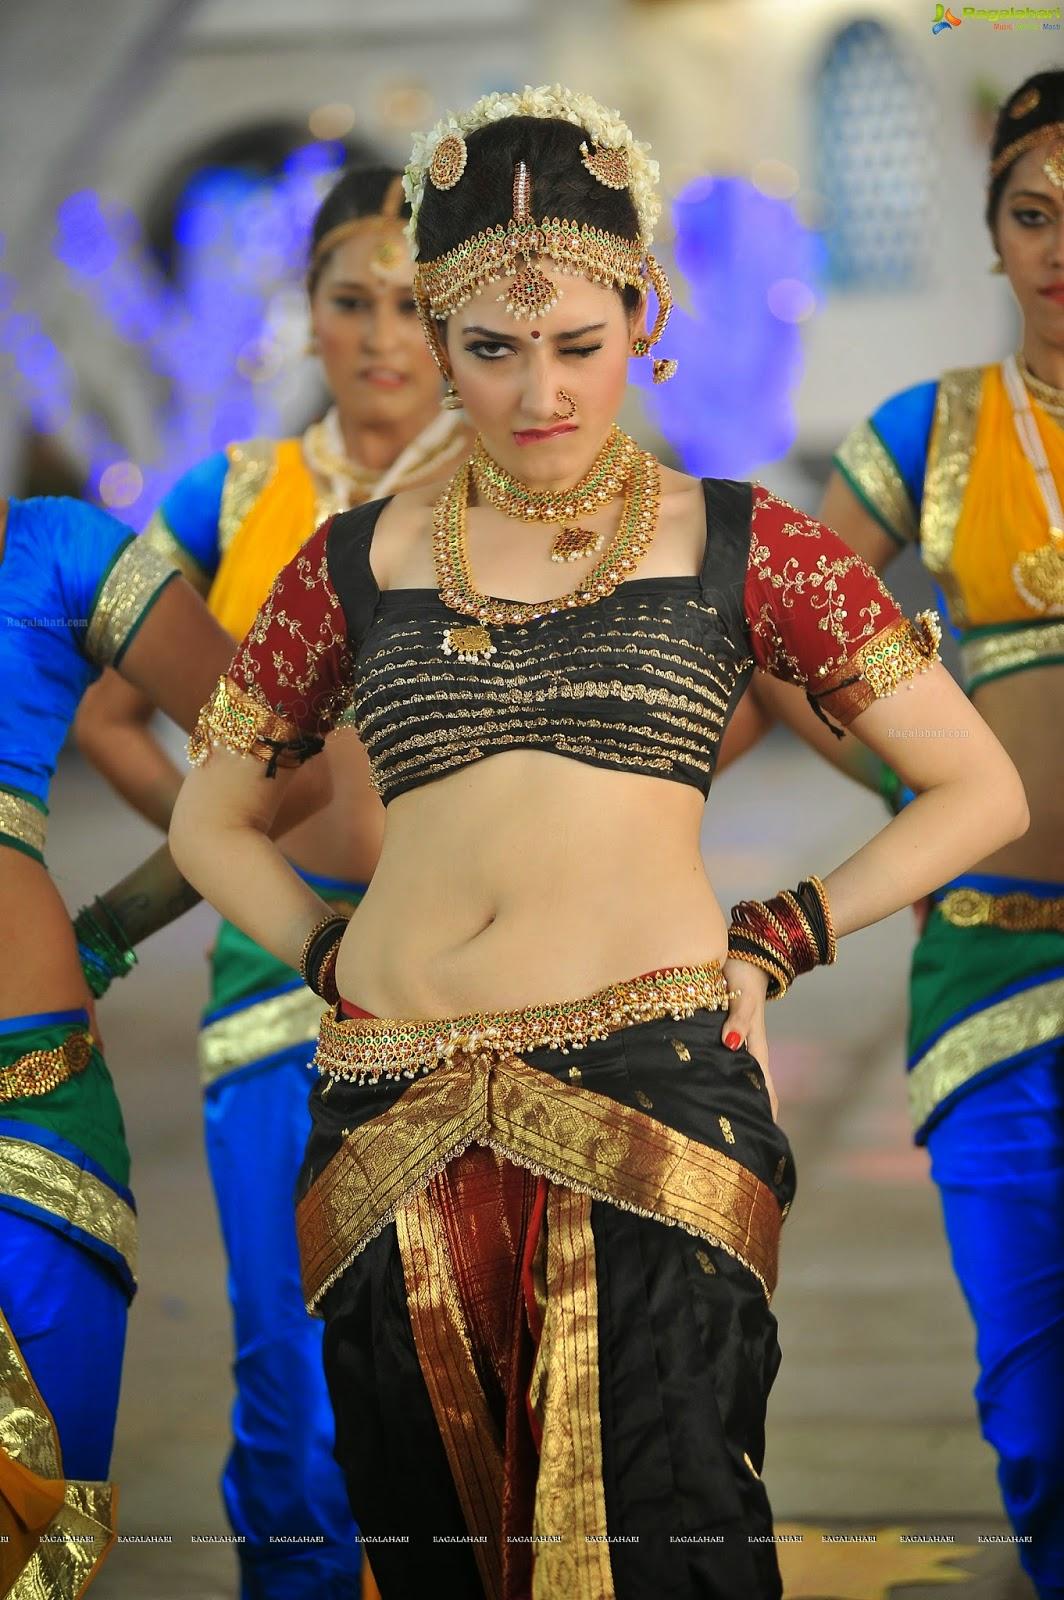 wsww: tamanna bhatia hot cute extraordinary song cameramen gangatho